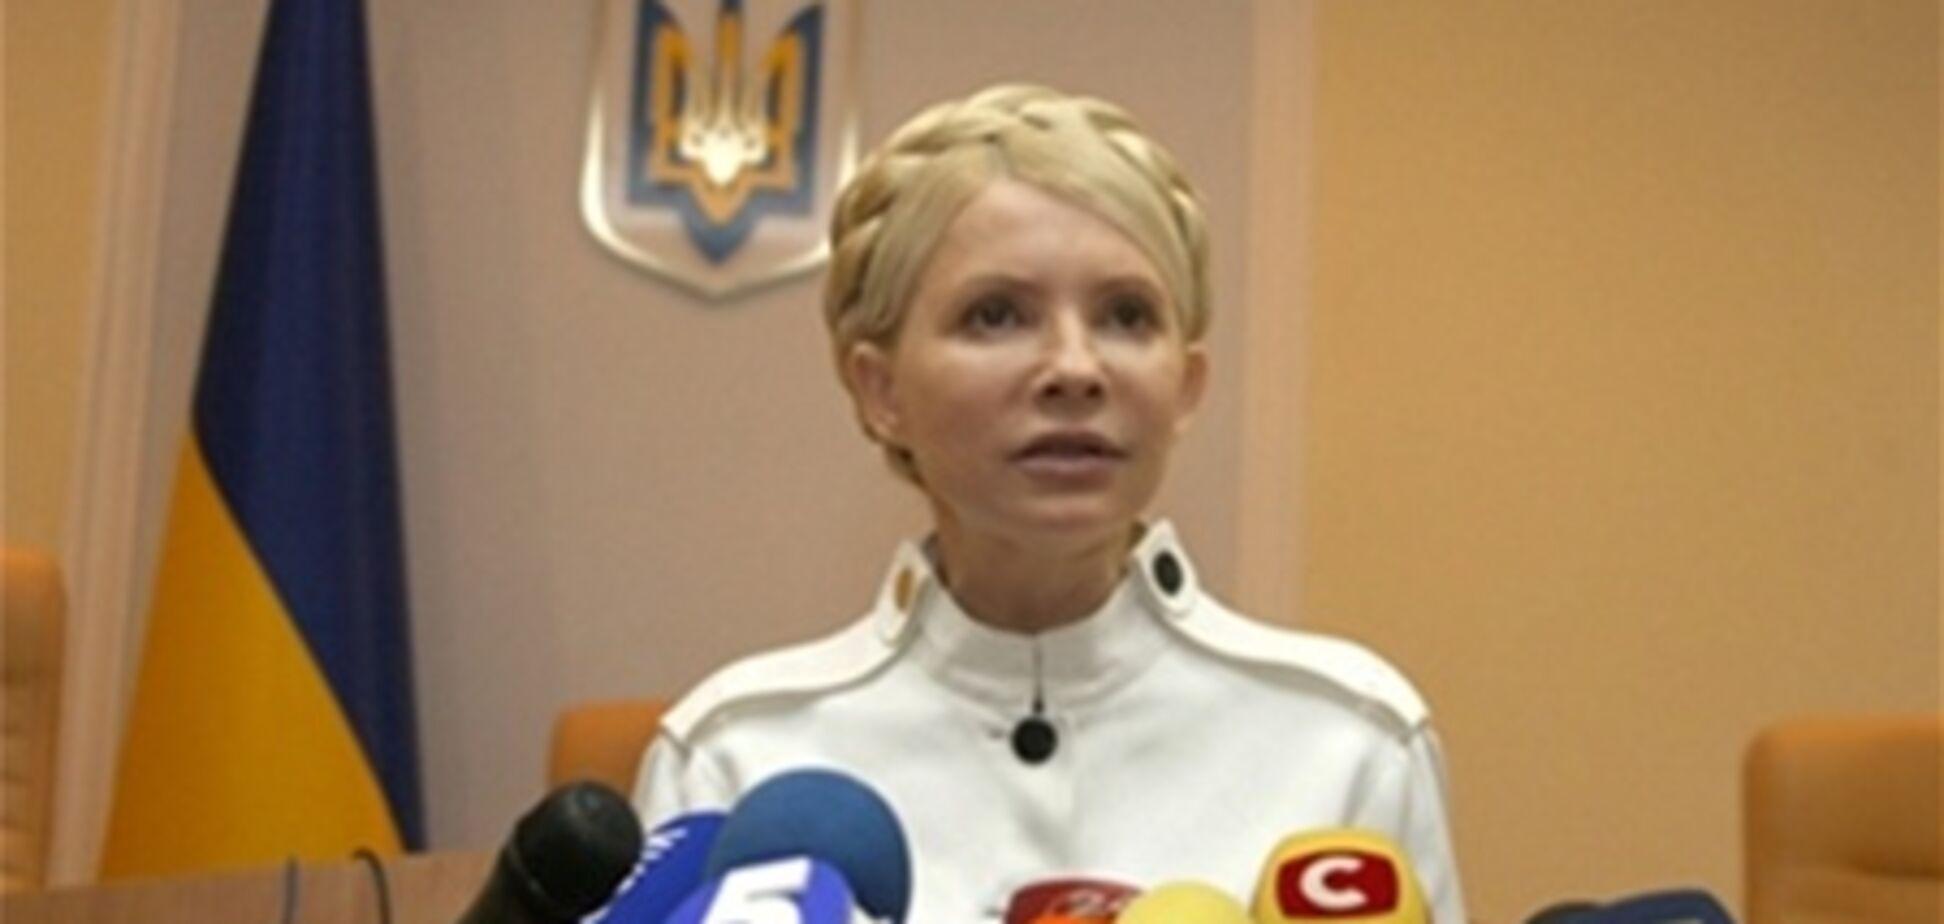 Тимошенко позвала на суд представителей Книги рекордов Гиннеса